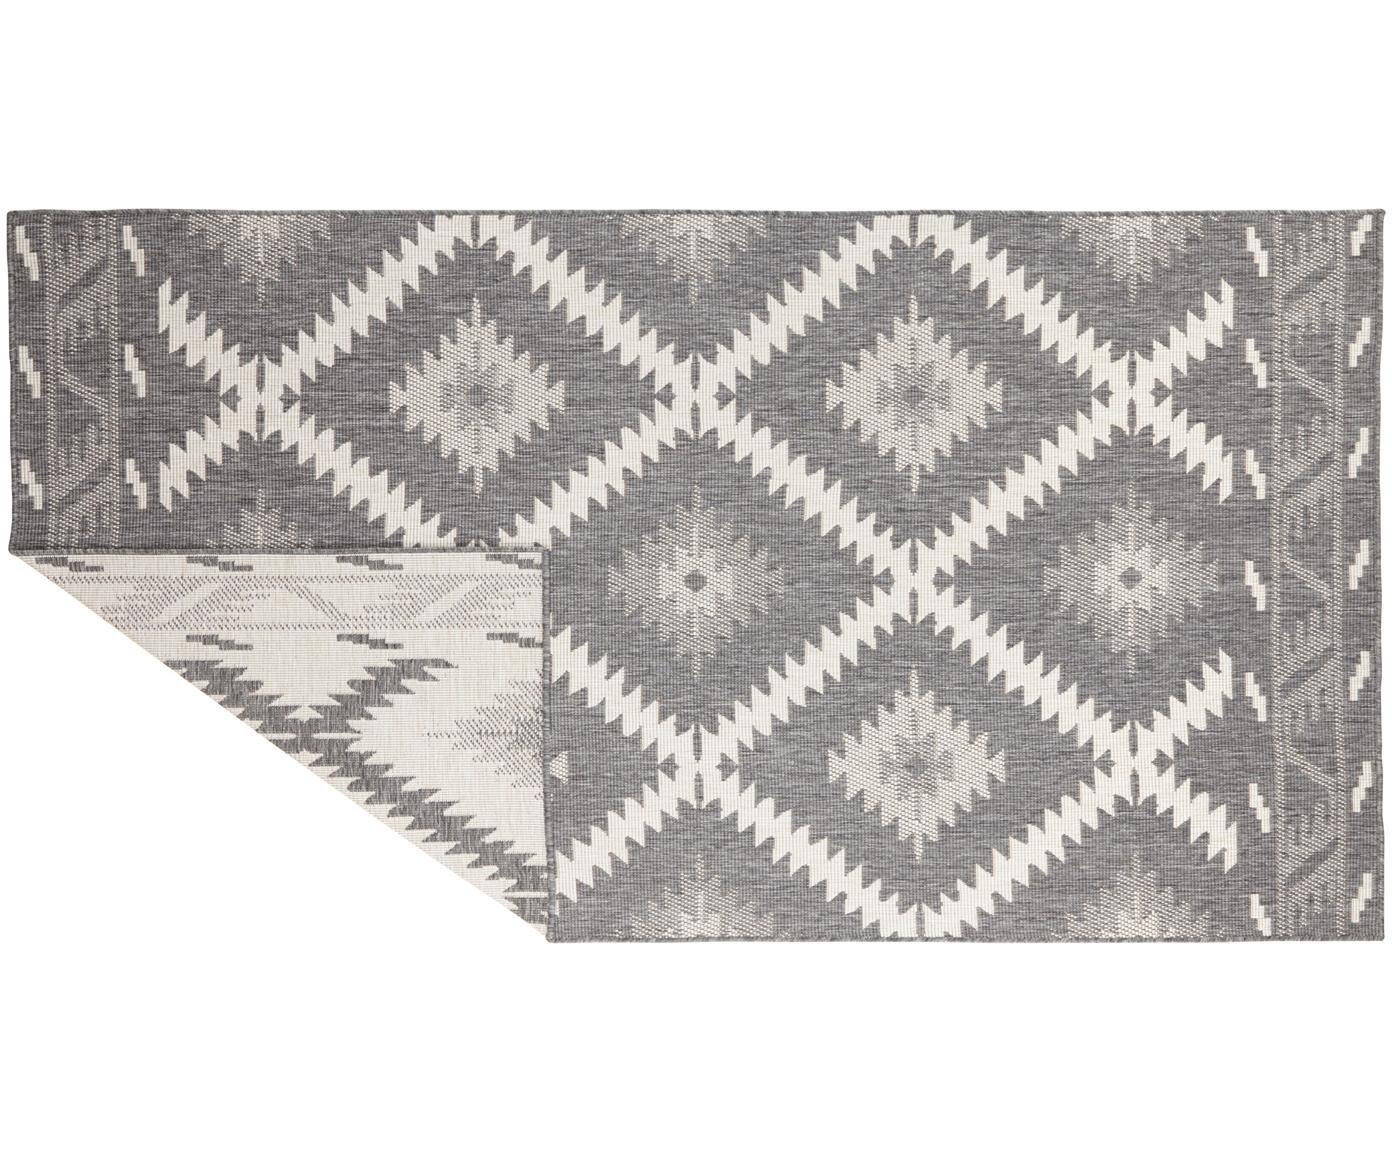 Alfombra reversible de interior/exterior Malibu, Gris, crema, An 80 x L 150 cm (Tamaño XS)